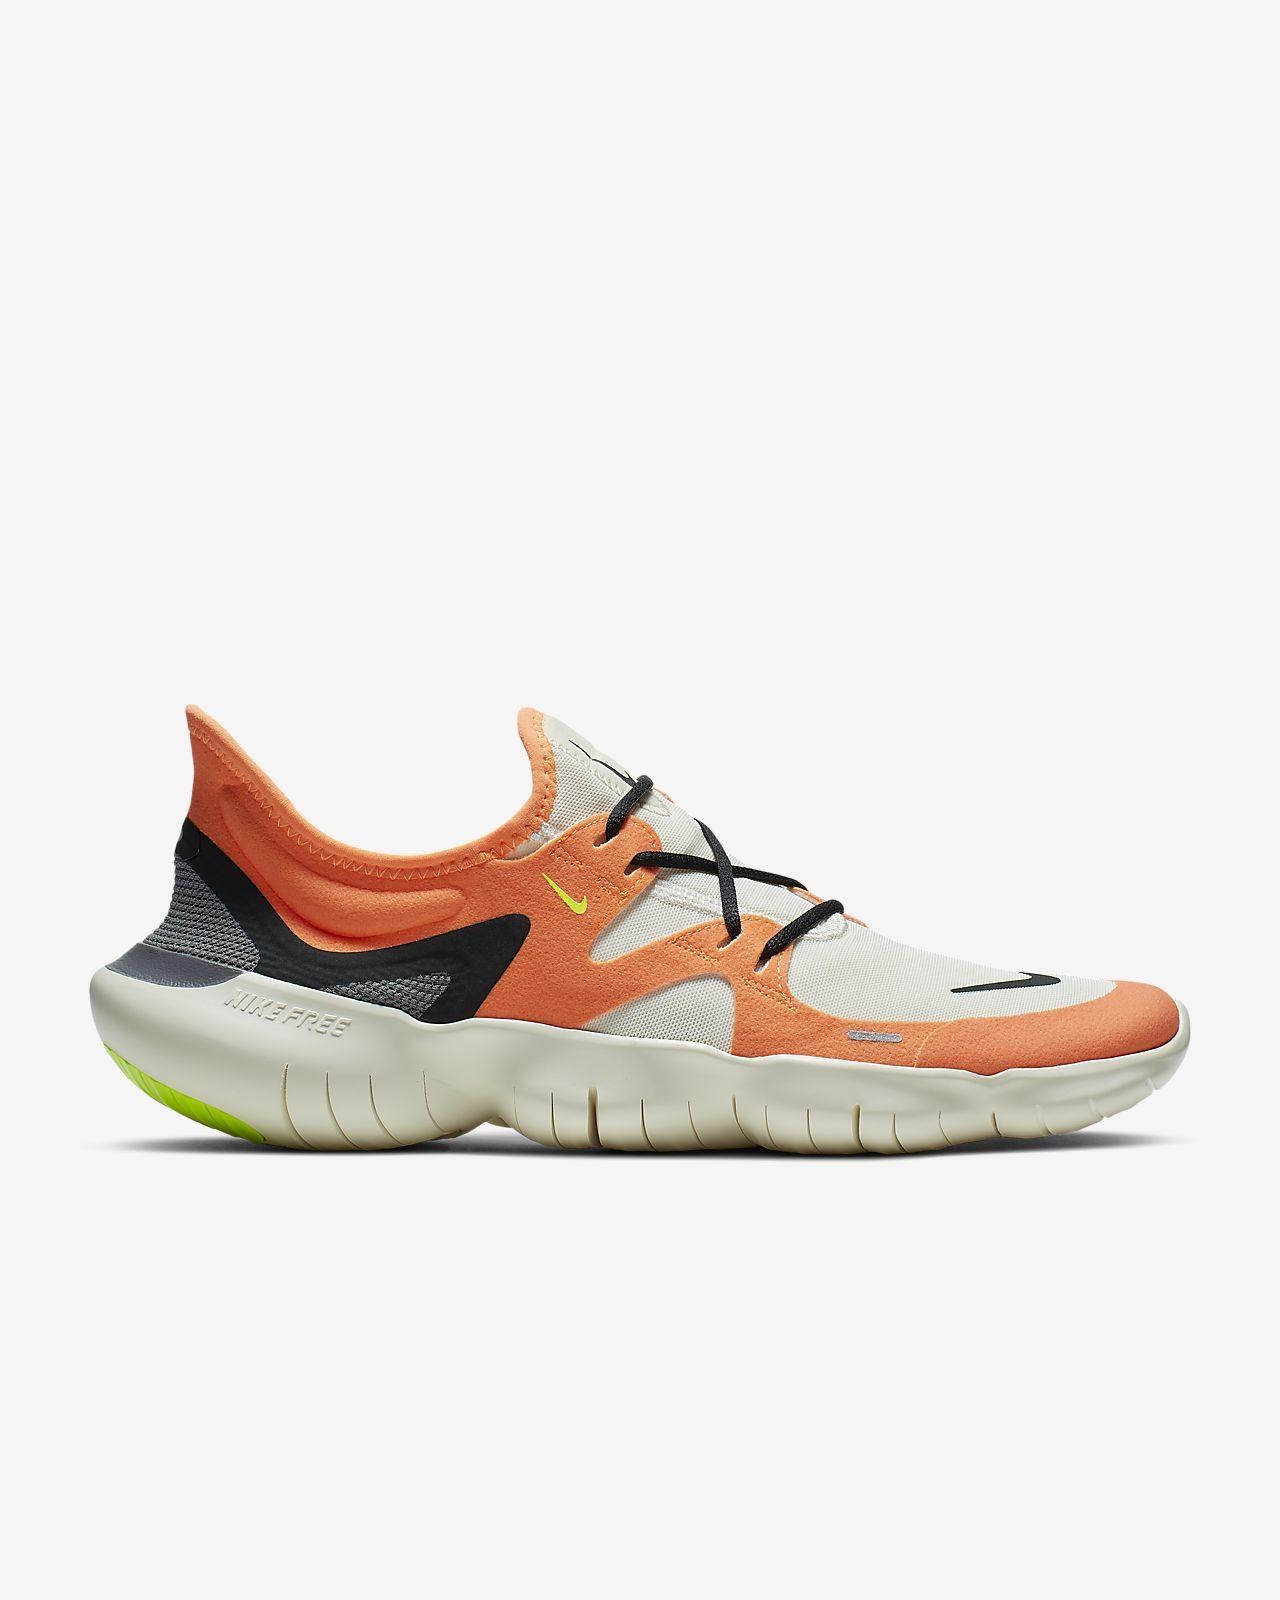 san francisco f62f5 86570 Nike Free RN 5.0 NRG